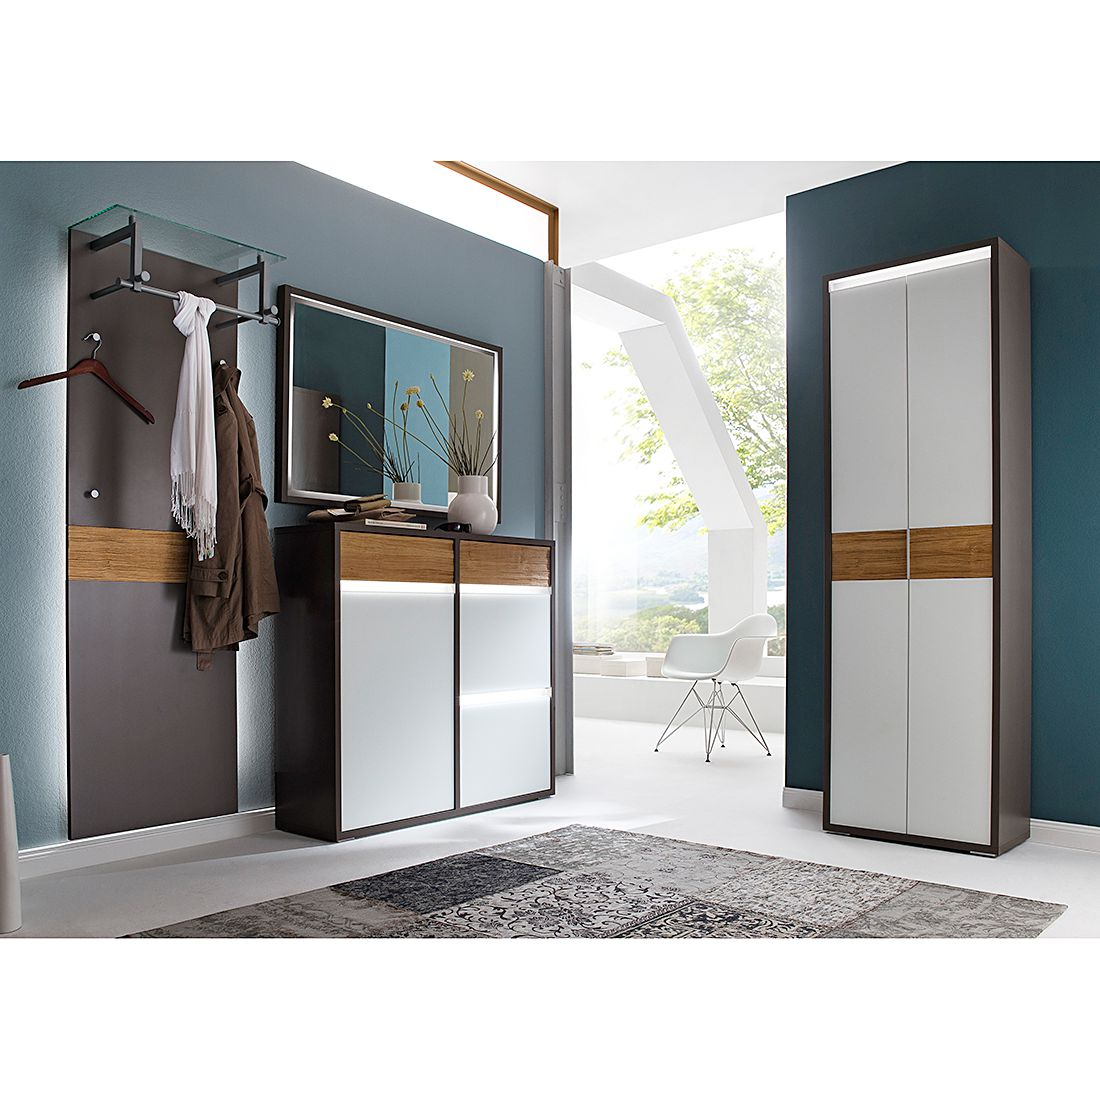 garderobe glas g nstig kaufen. Black Bedroom Furniture Sets. Home Design Ideas